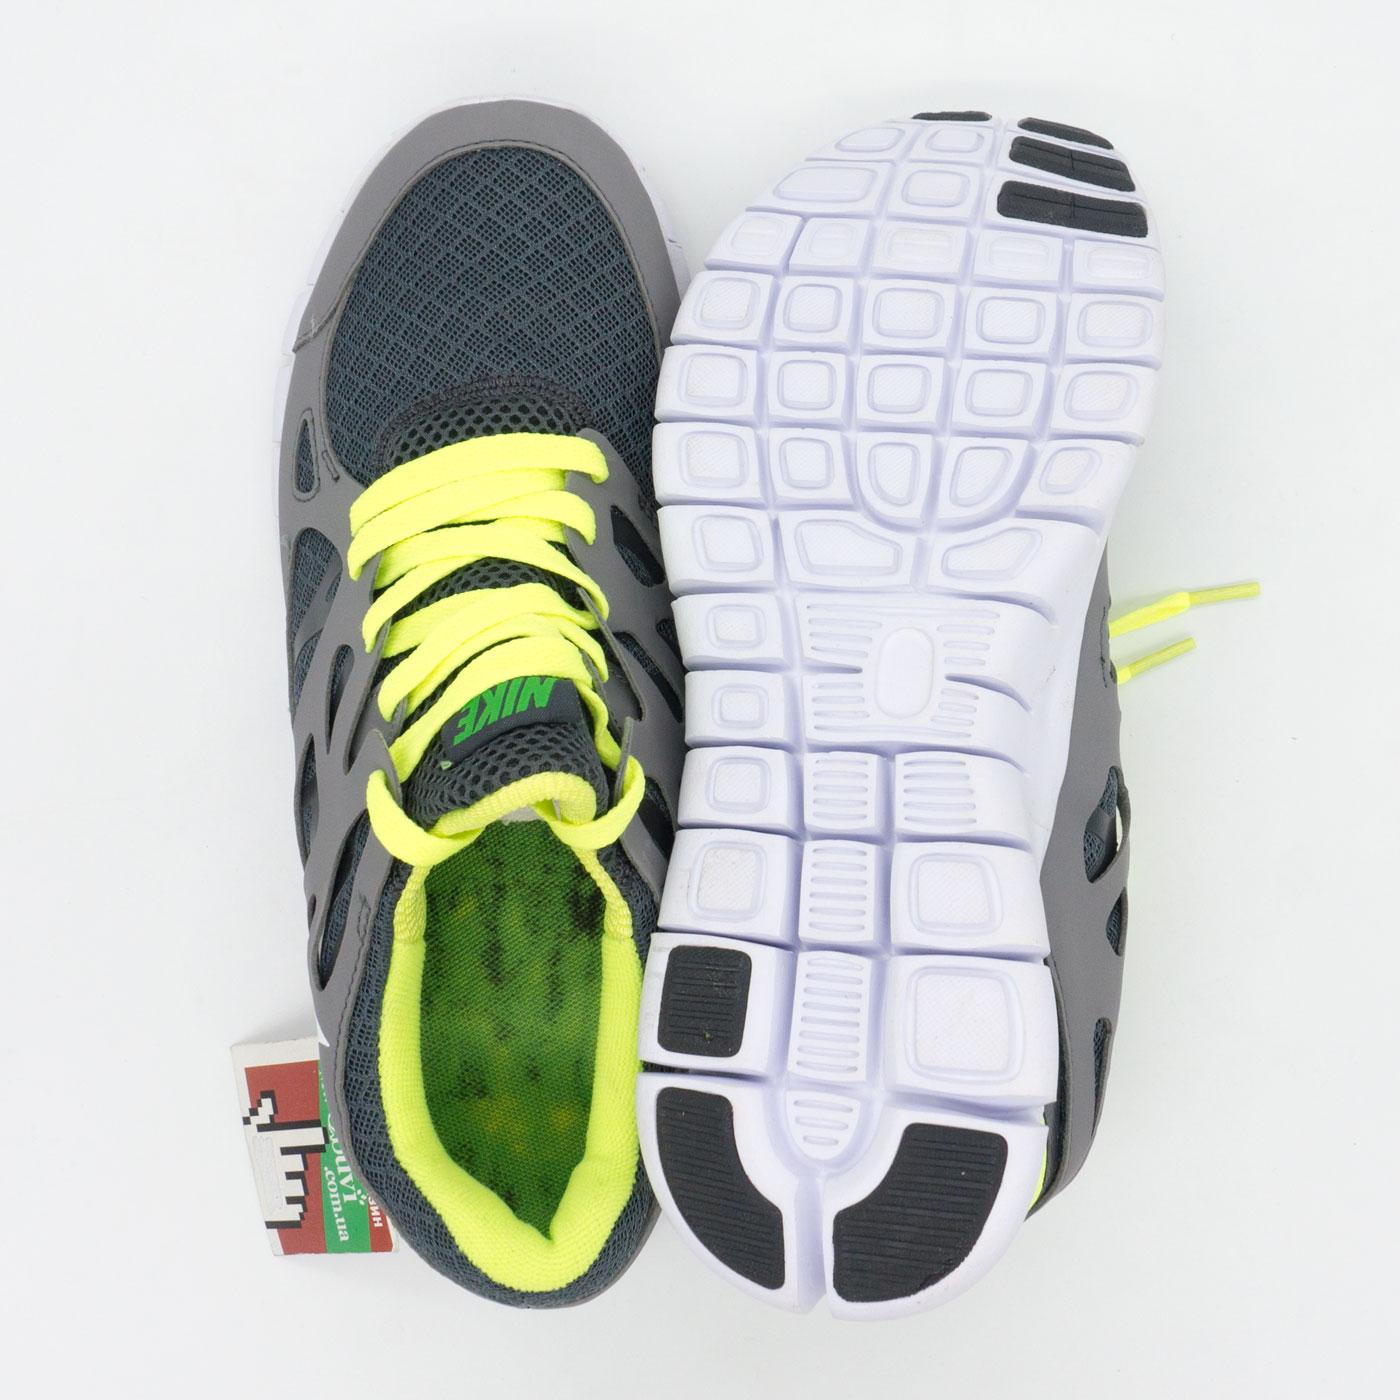 фото bottom Кроссовки для бега Nike Free Run 2 Найк Фри Ран, серо-зеленые bottom